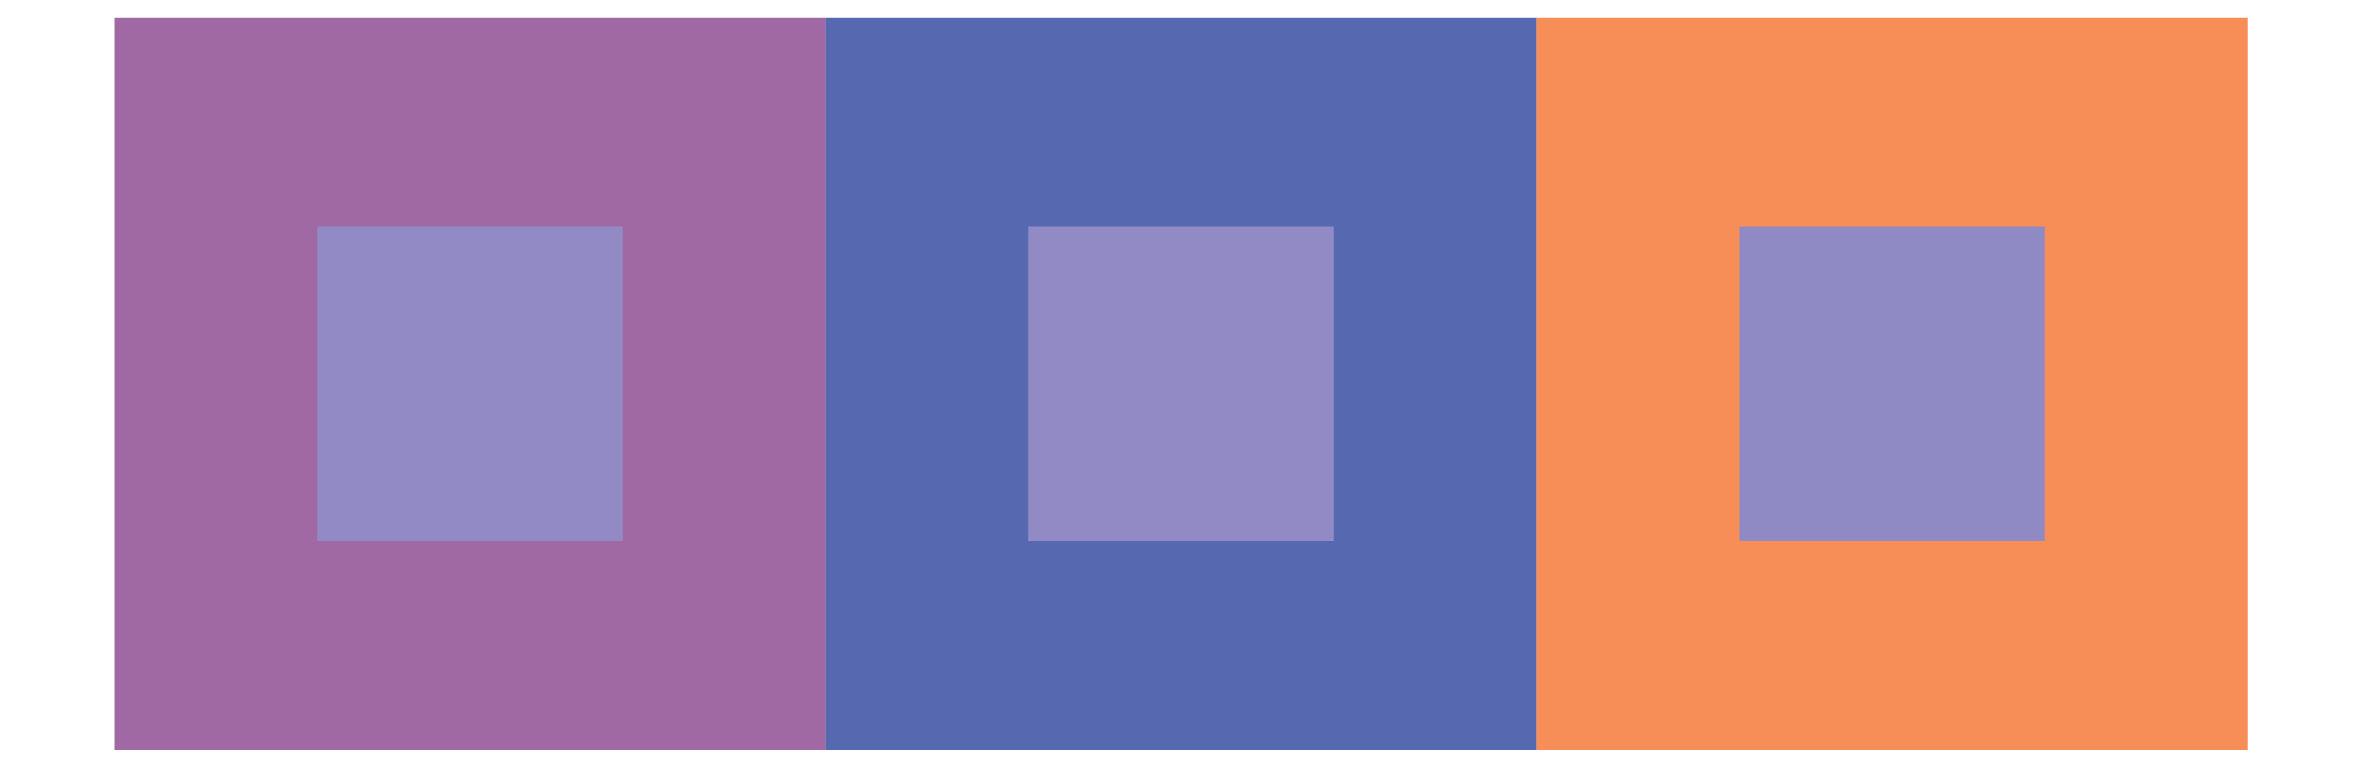 Lila mönsterfärger.jpg